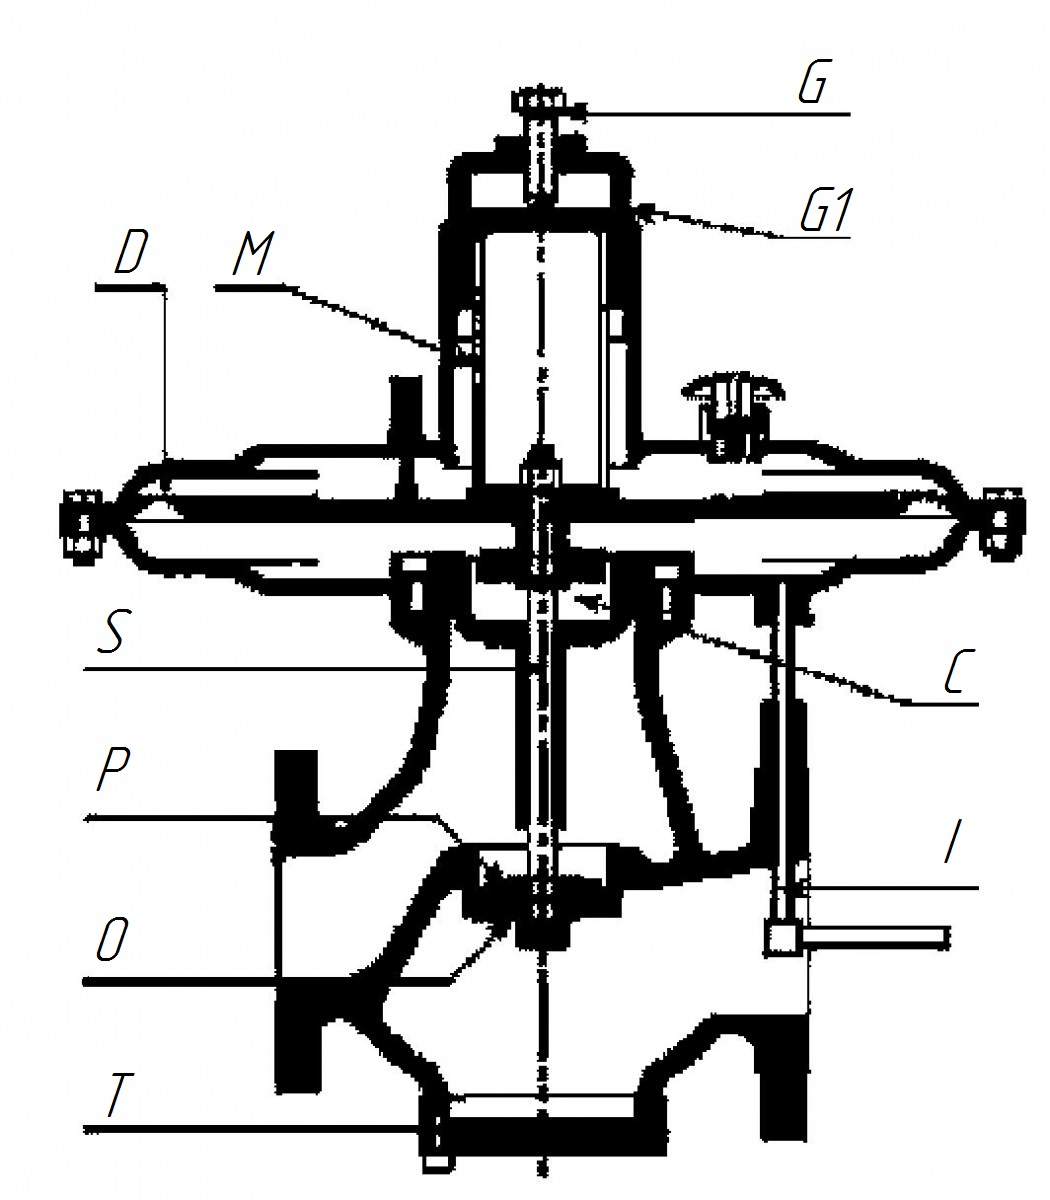 схема регулятора давления газа рдбк1-50